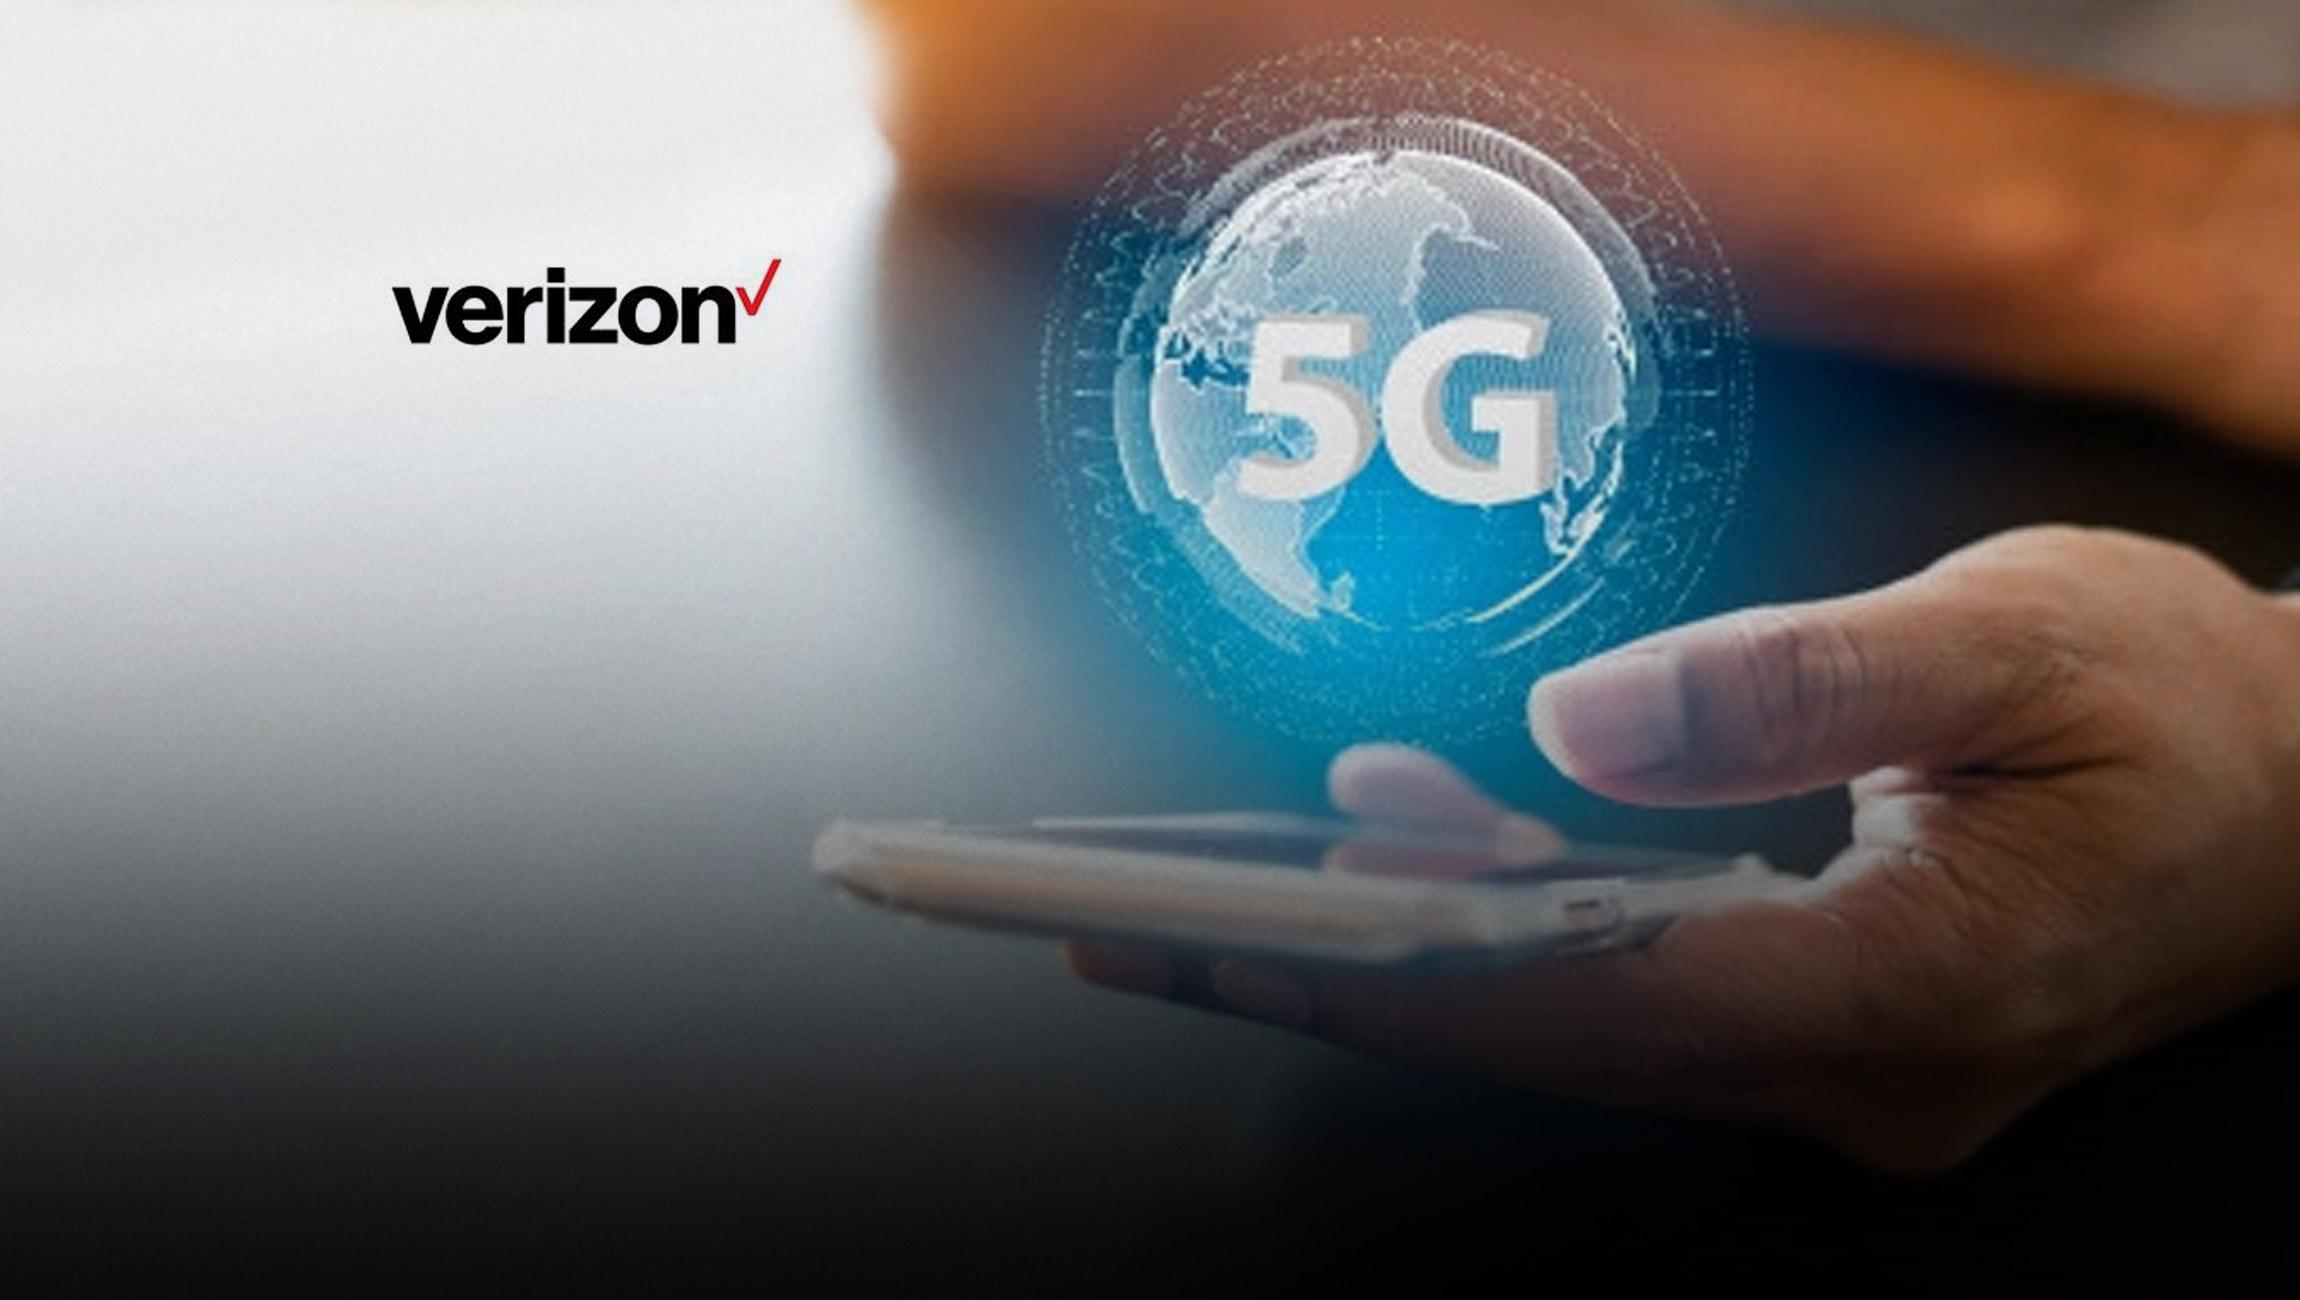 Verizon-Business-Brings-Verizon-5G-Ultra-Wideband-to-SAP-Labs